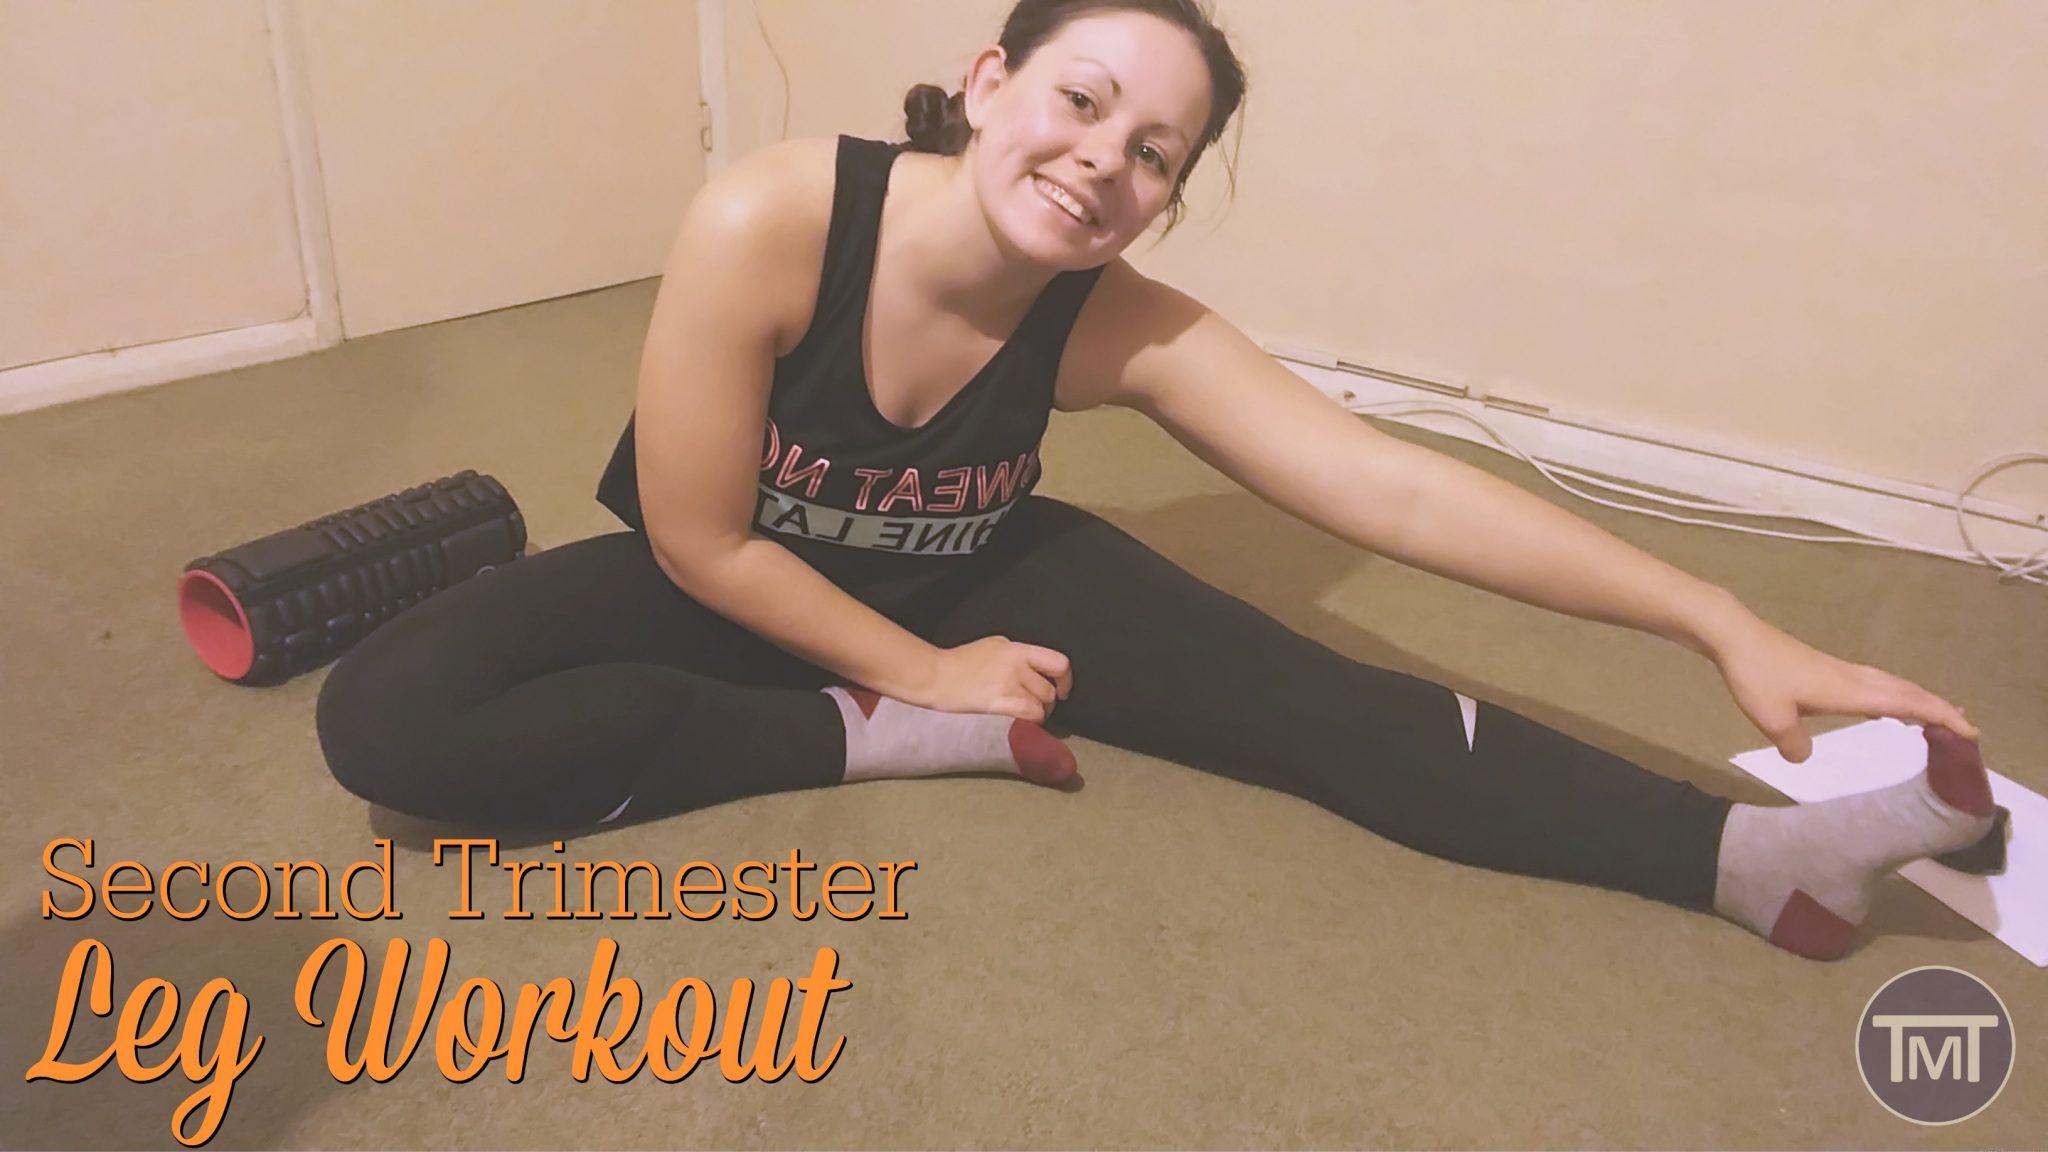 second trimester leg workout feature image